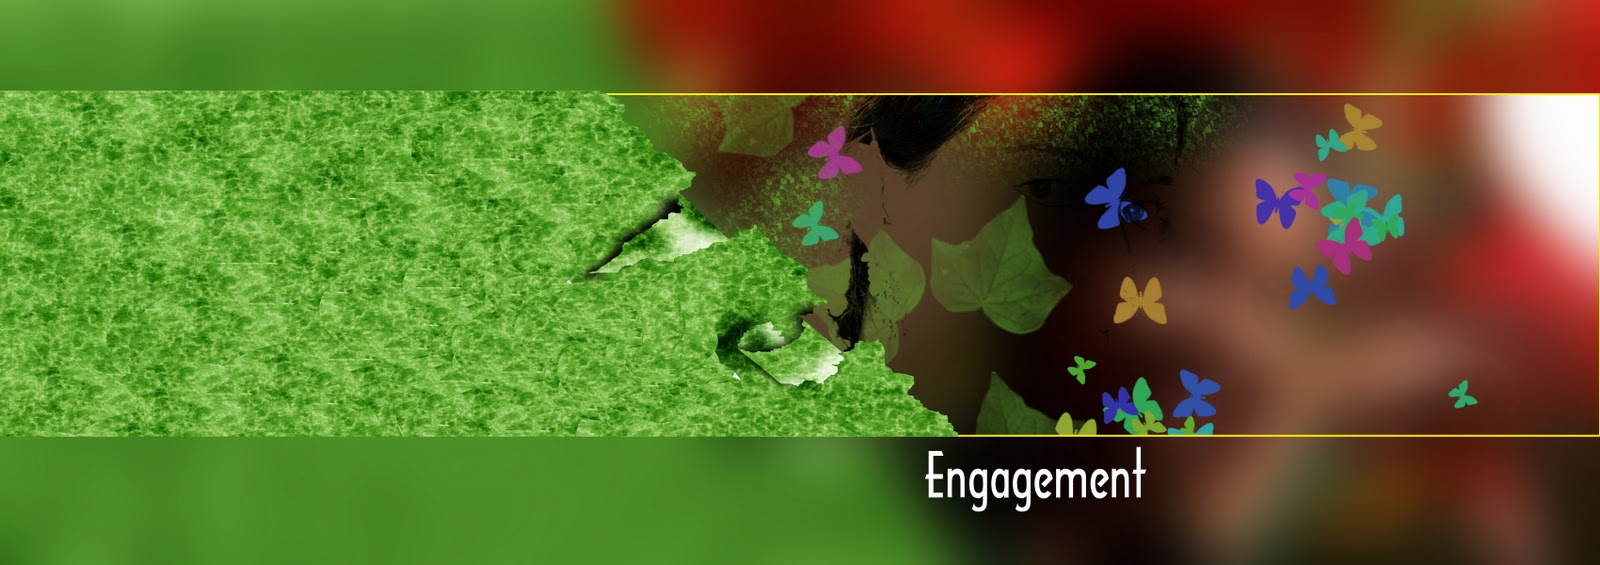 free wedding album templates photoshop